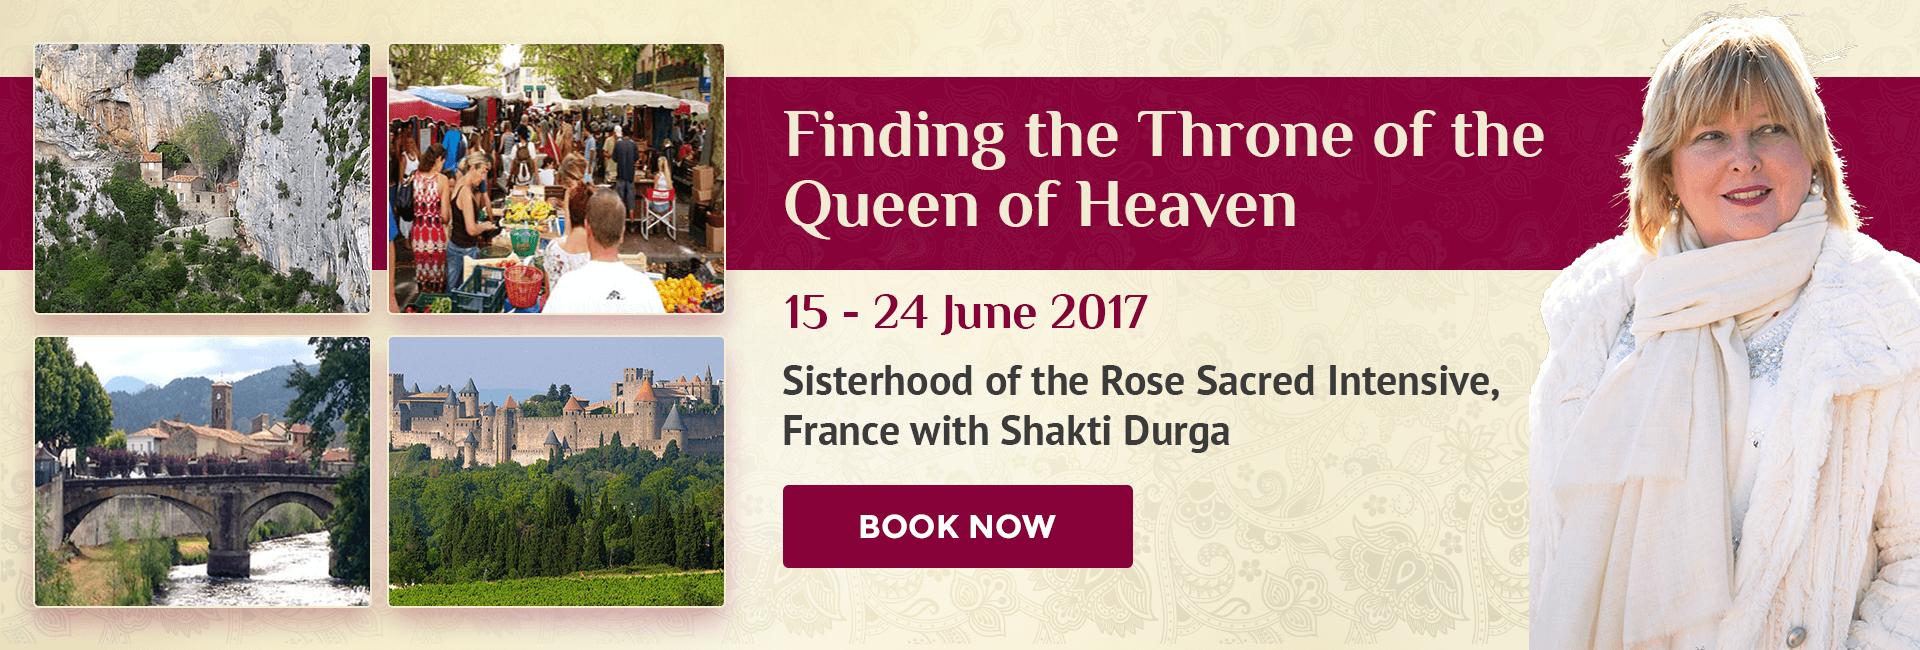 Sisterhood of the Rose Intensive, Shakti Durga Retreats